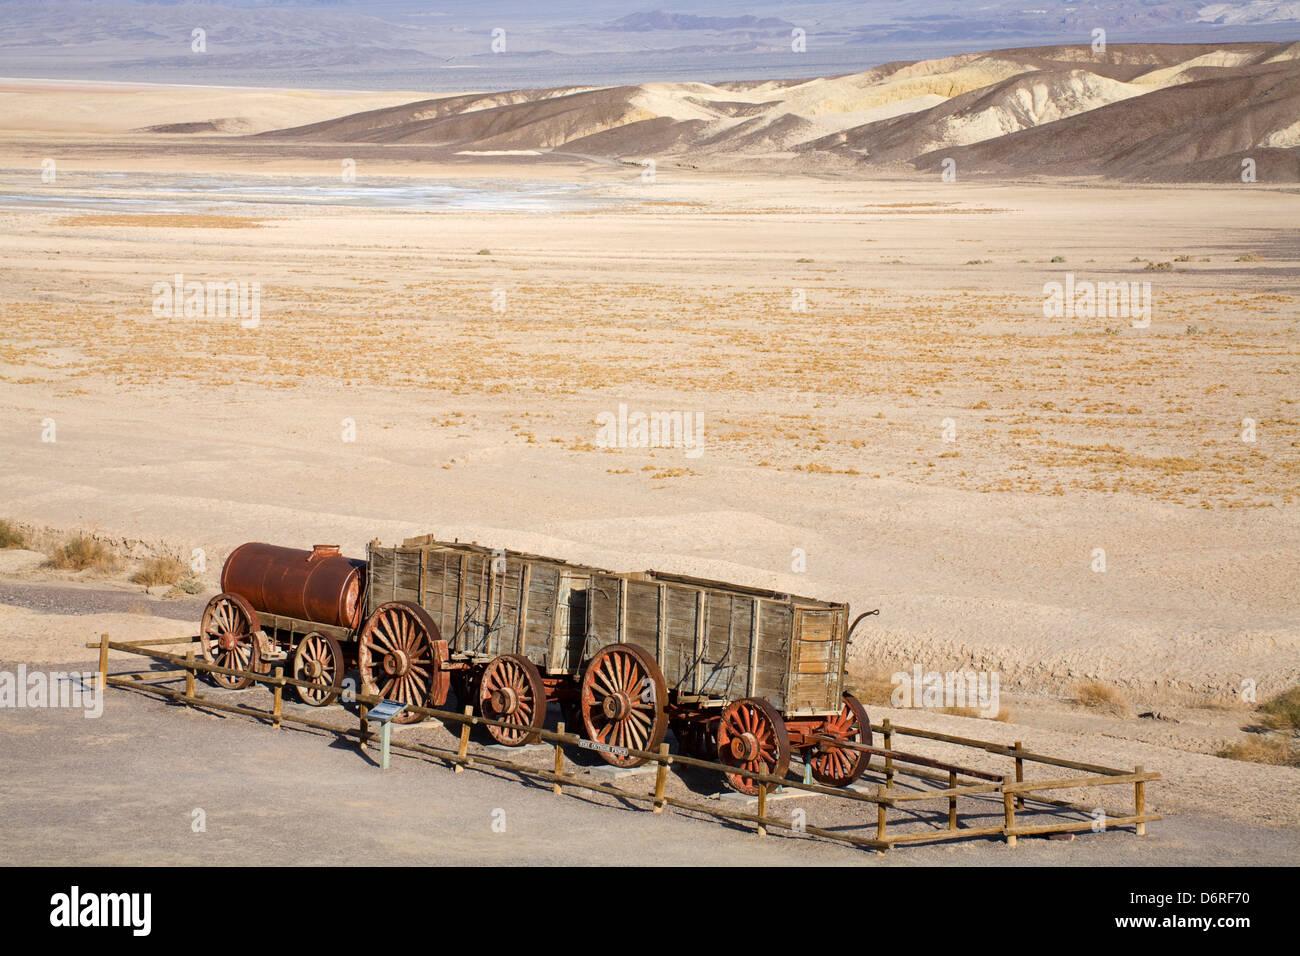 20 mule team wagon stock photos 20 mule team wagon stock images alamy for 20 mule team borax swimming pools